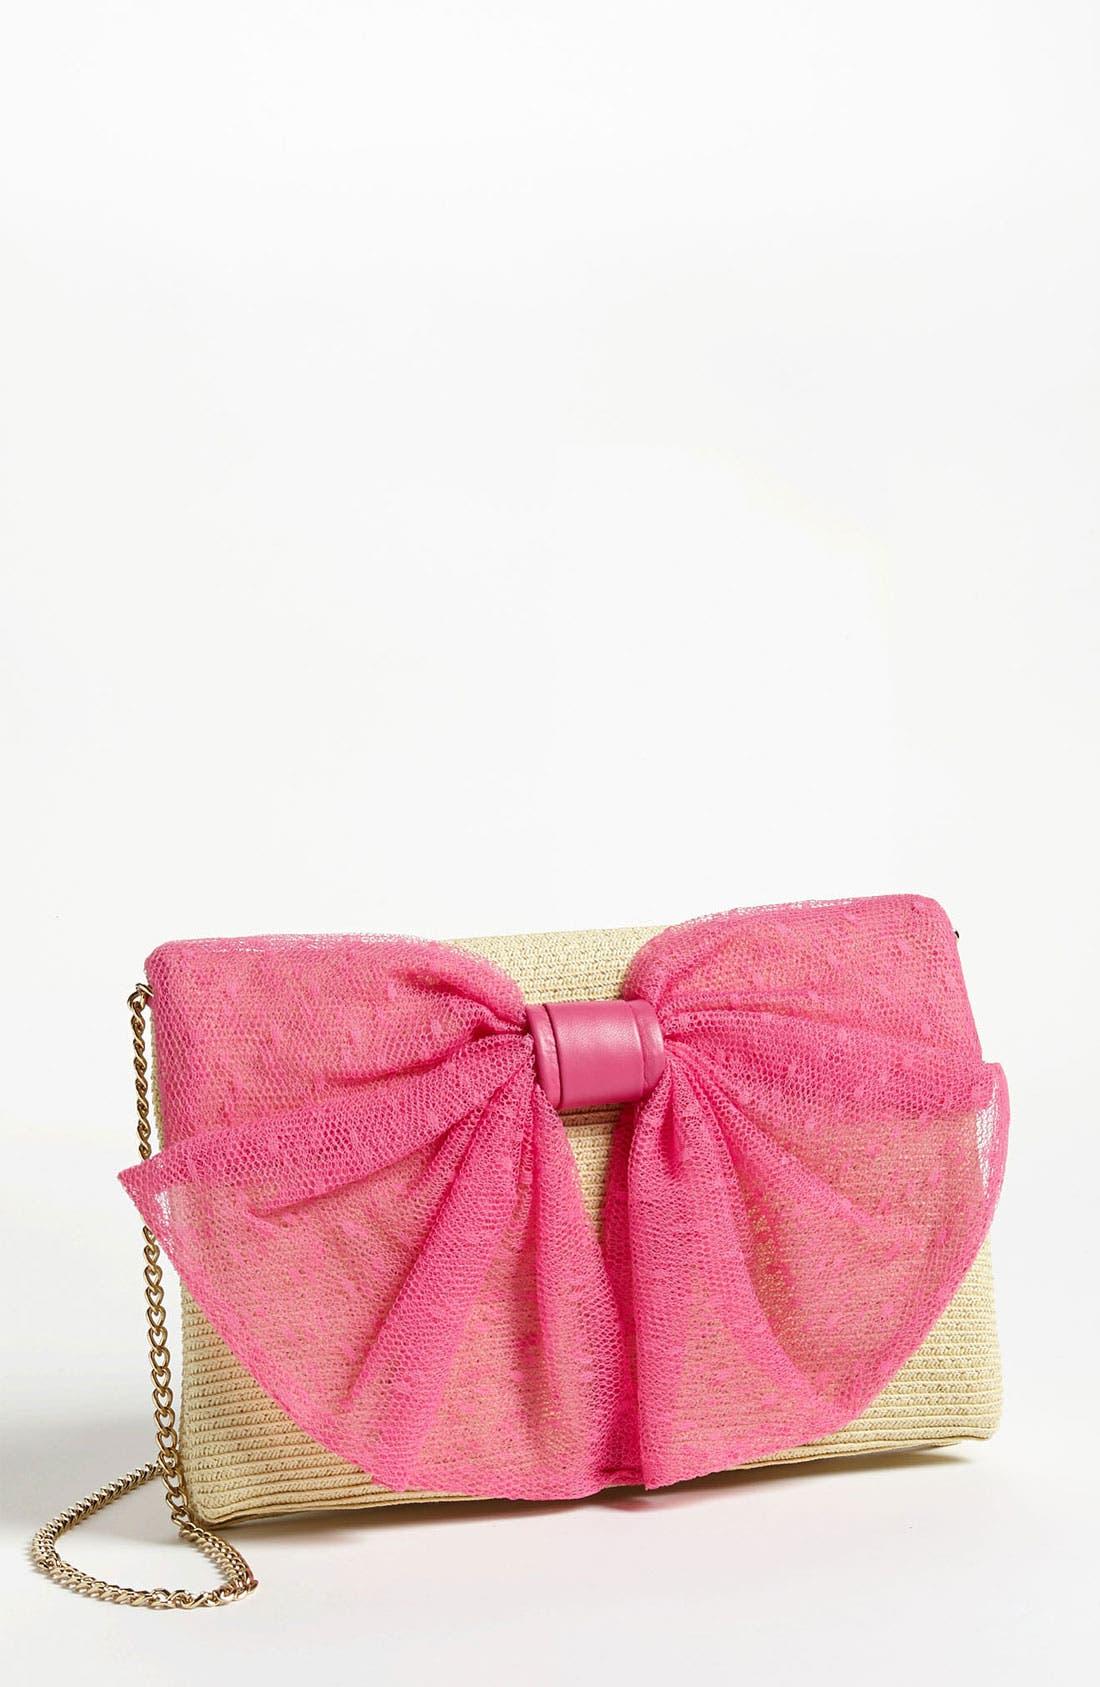 Main Image - RED Valentino 'Bow' Straw Crossbody Bag